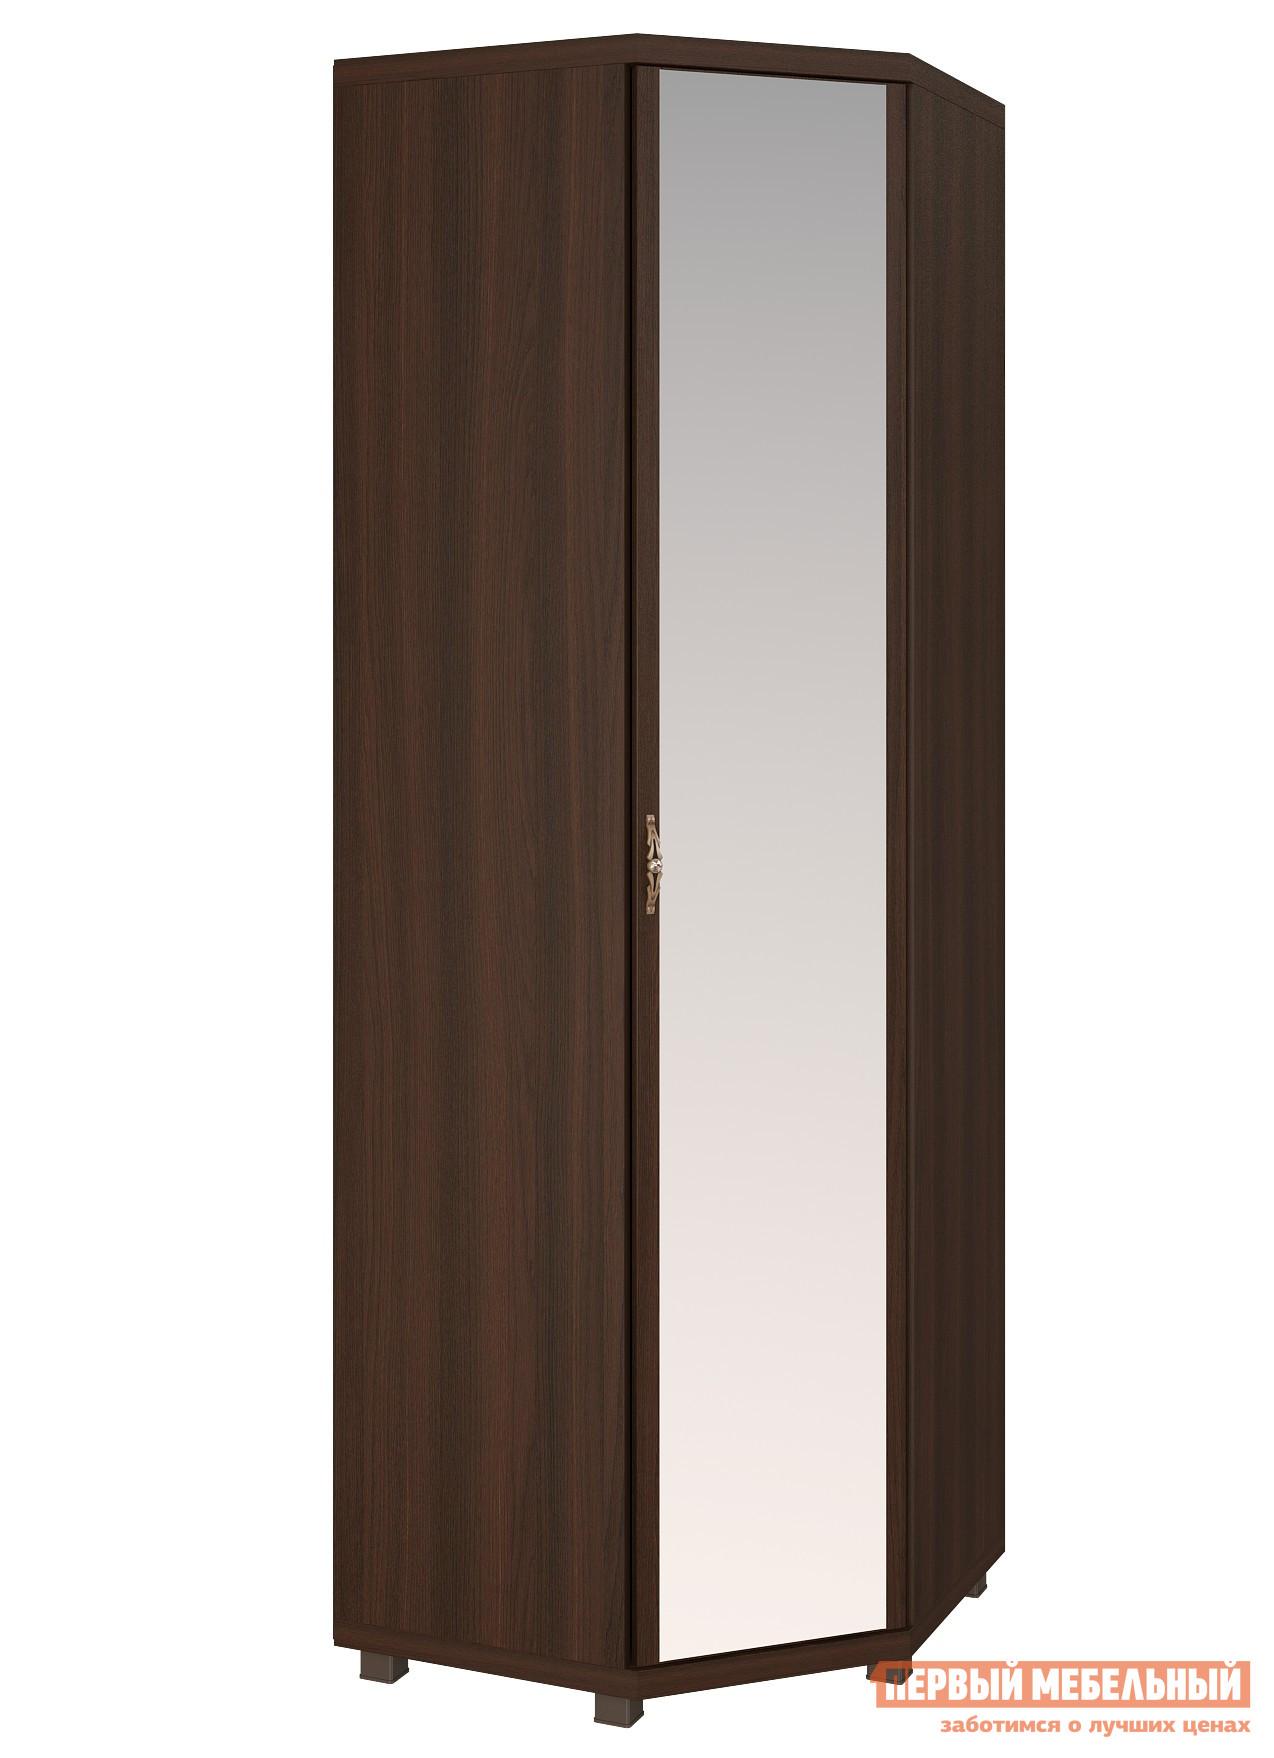 Шкаф распашной ТД Арника Ирис 27